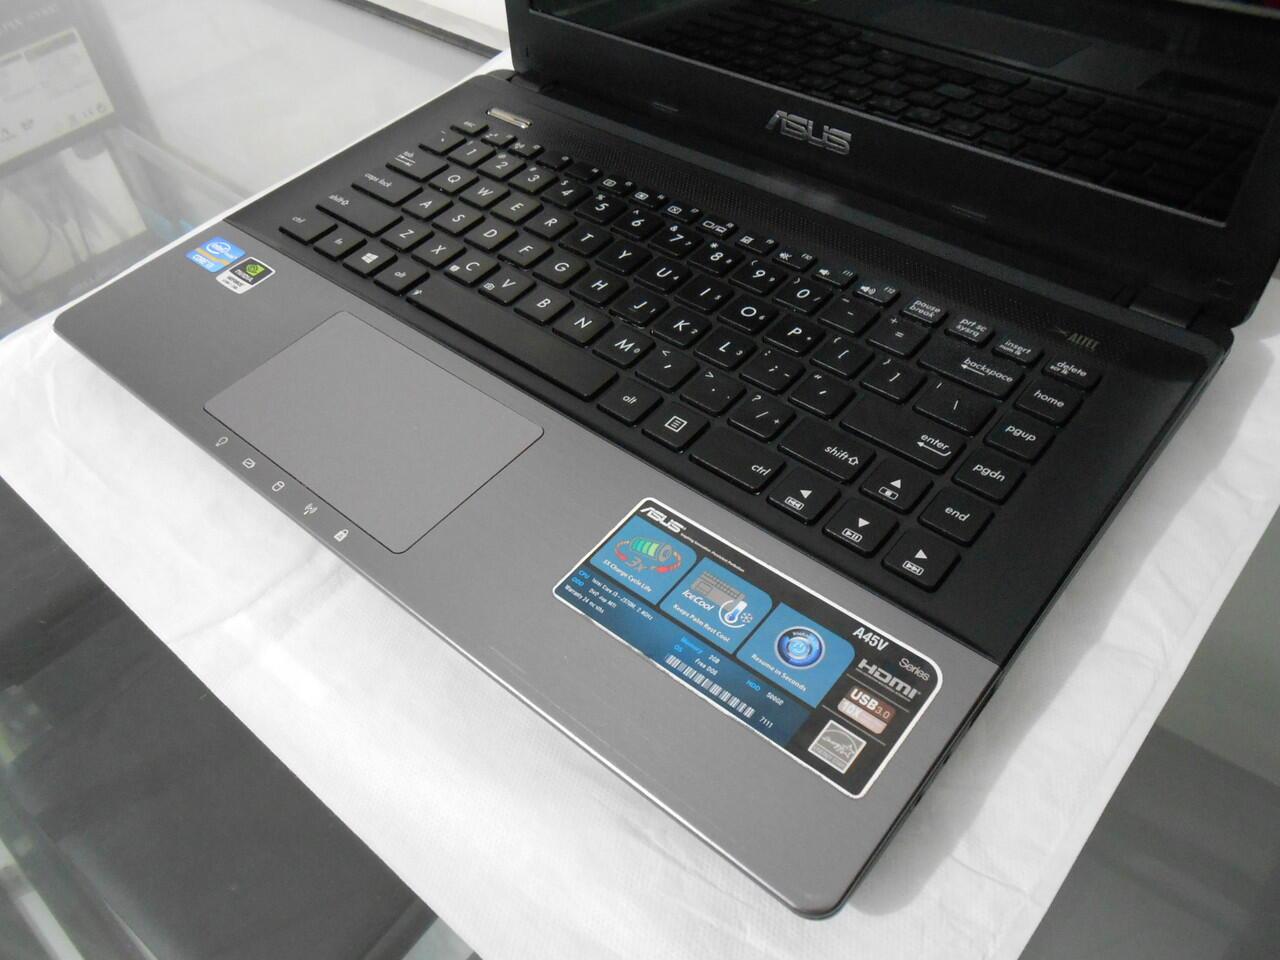 ASUS A45VD COREI3 SANDY NVIDIA 2GB || SURABAYA ||